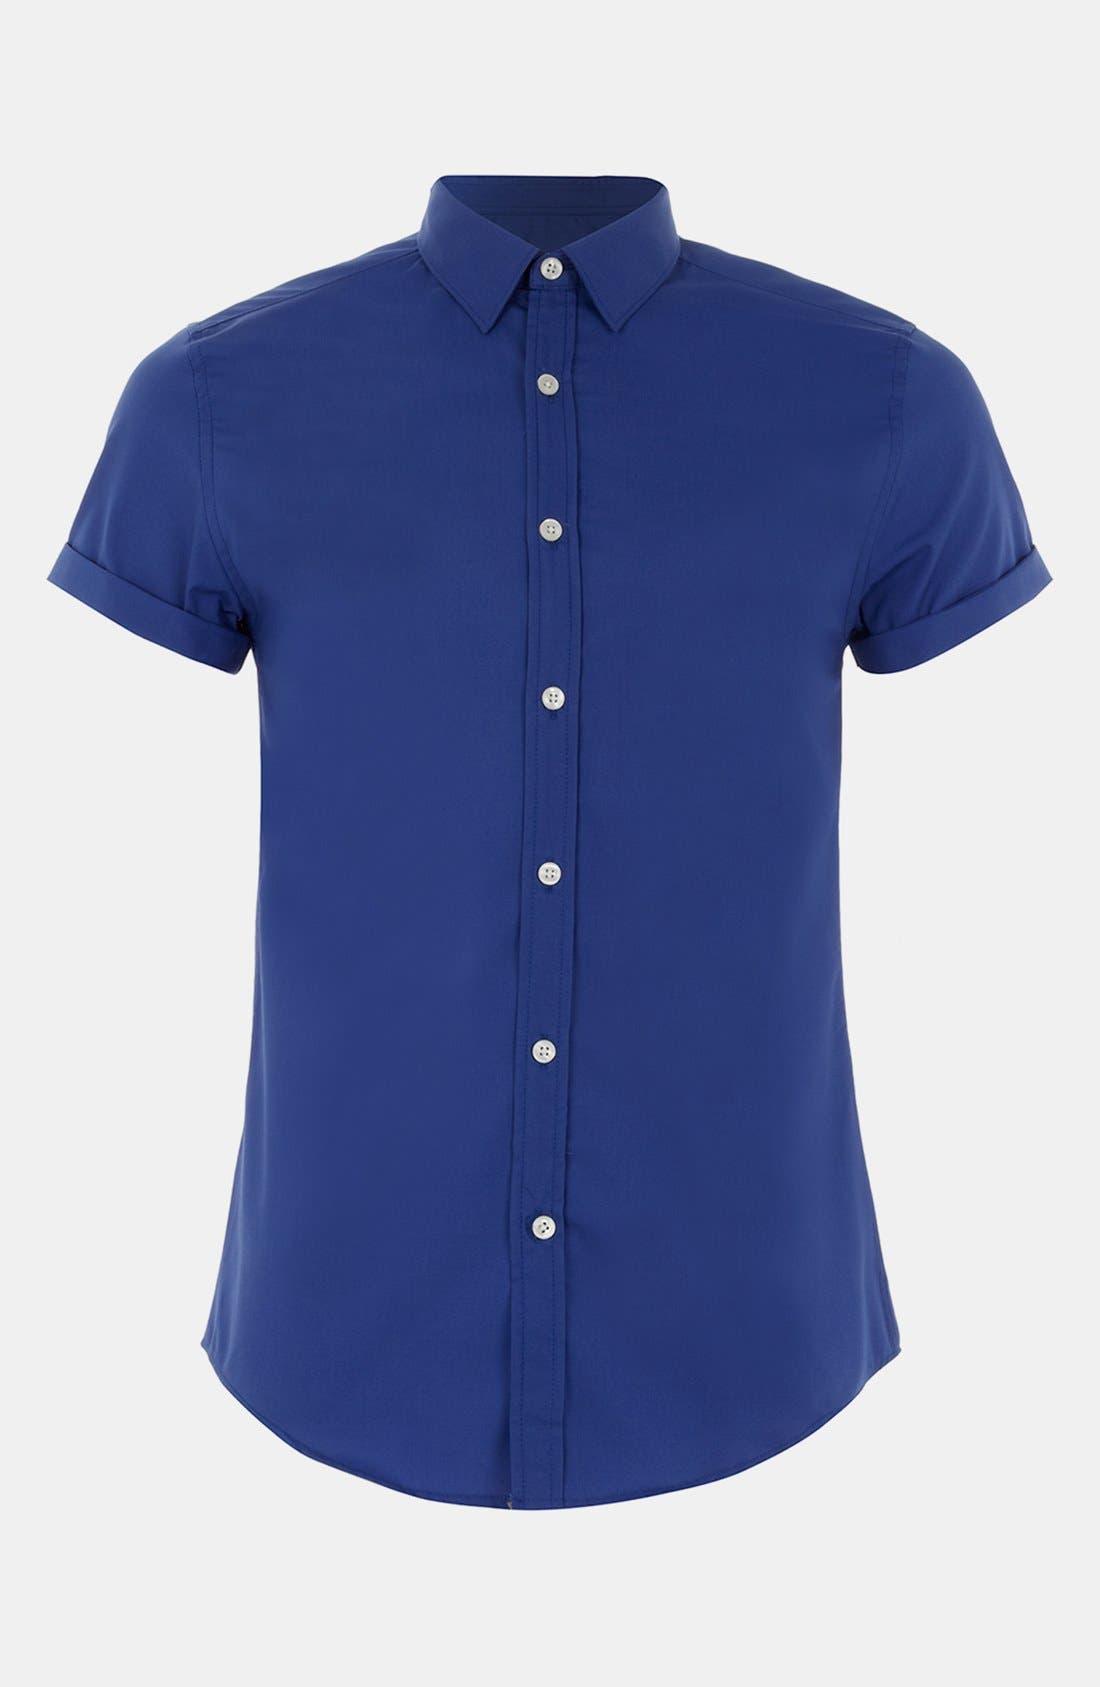 Alternate Image 1 Selected - Topman Short Sleeve Shirt